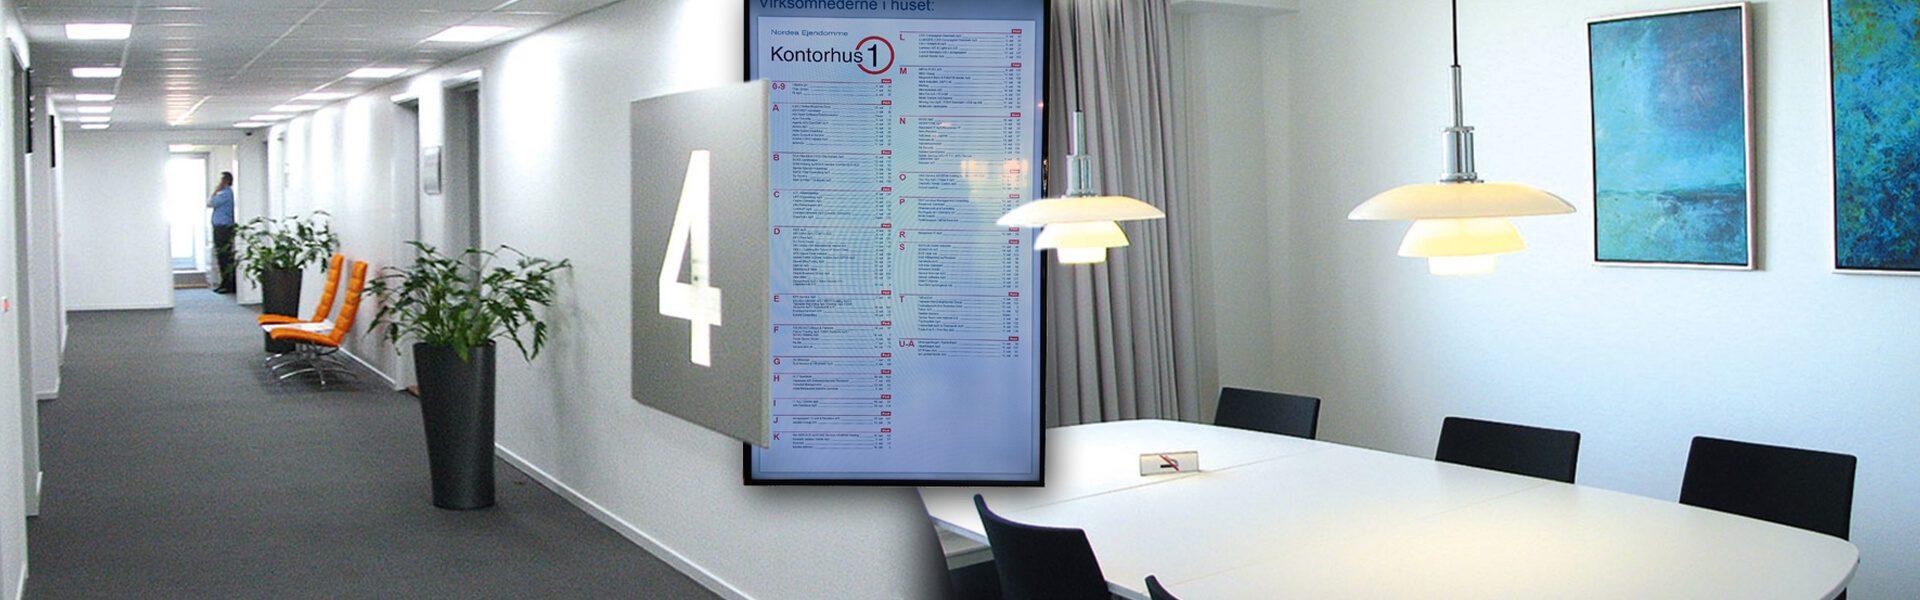 Telefon-Service_Glostrup_Kontorhotel